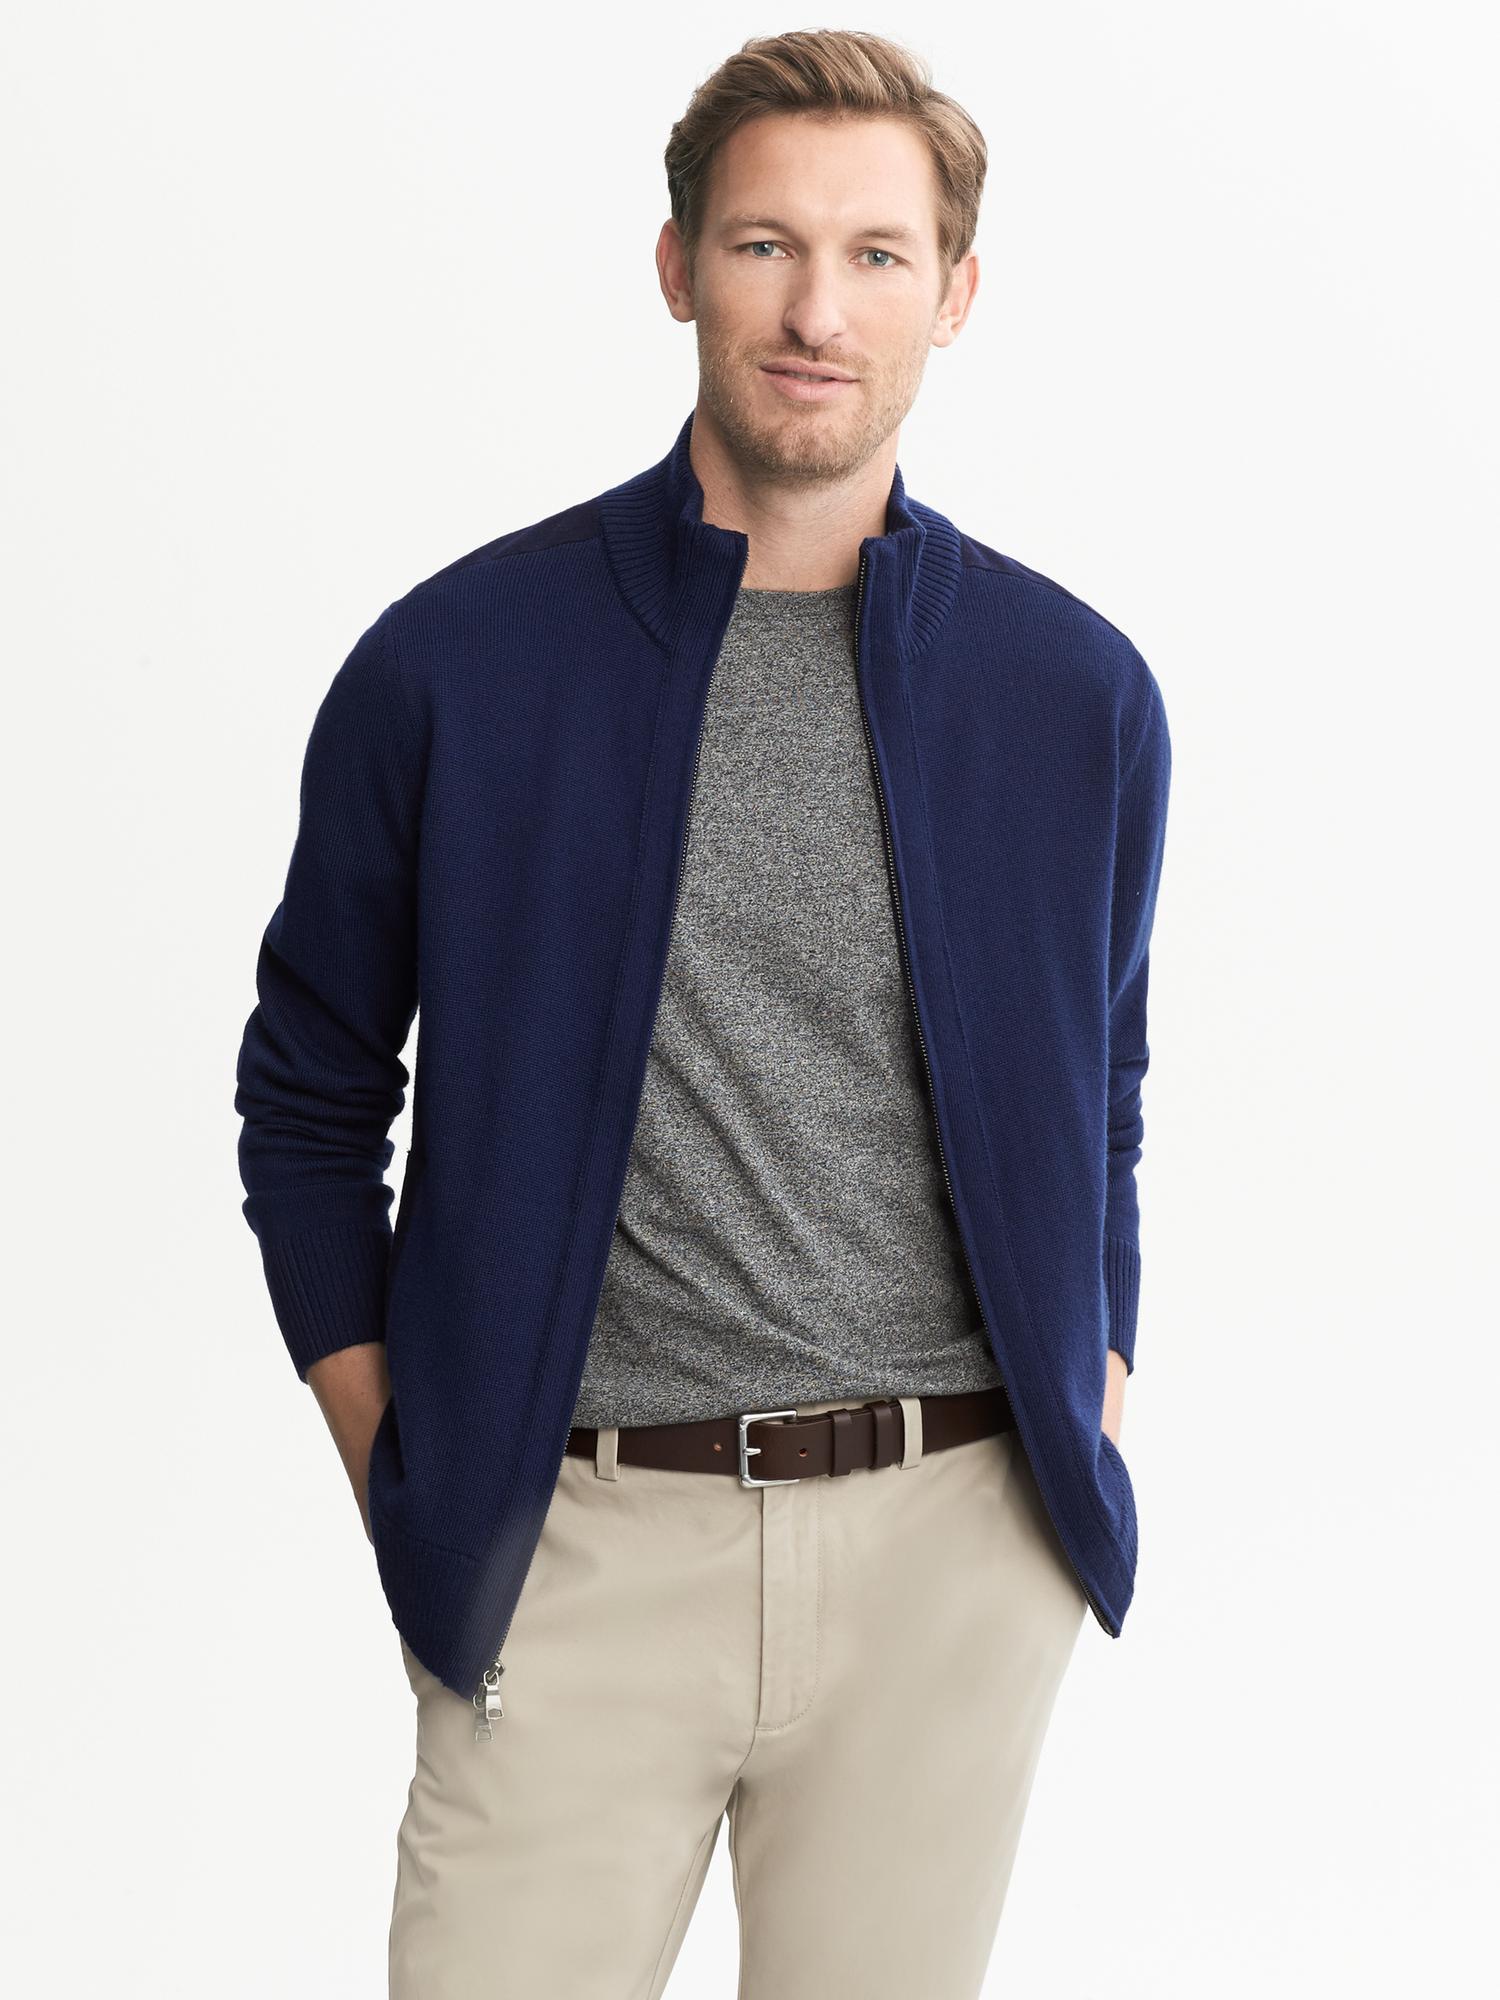 Republic Silkcashmere Half Zip Sweater - Sweater Grey